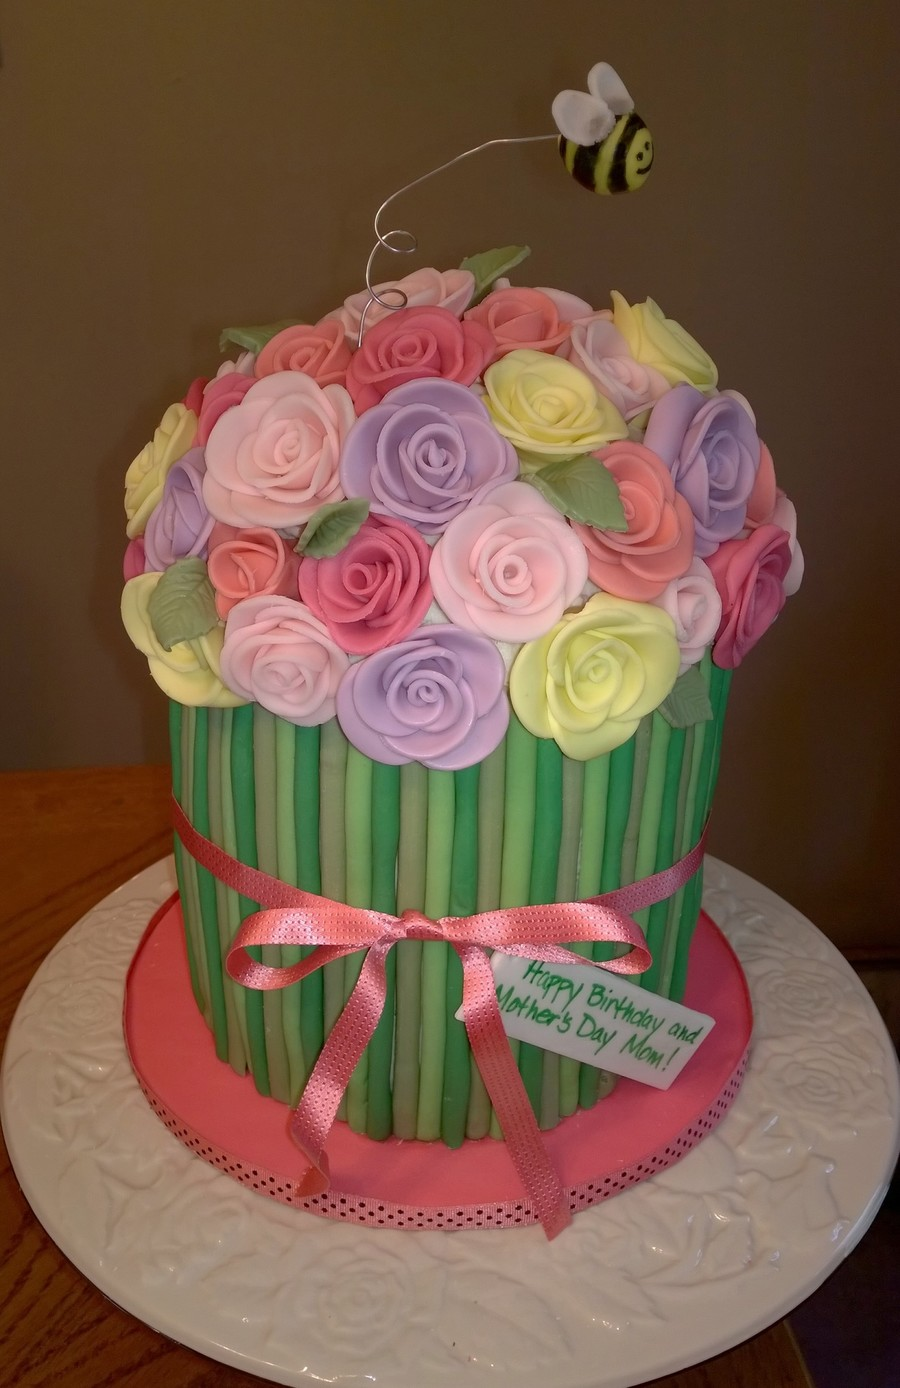 Bouquet Of Flowers Cake - CakeCentral.com